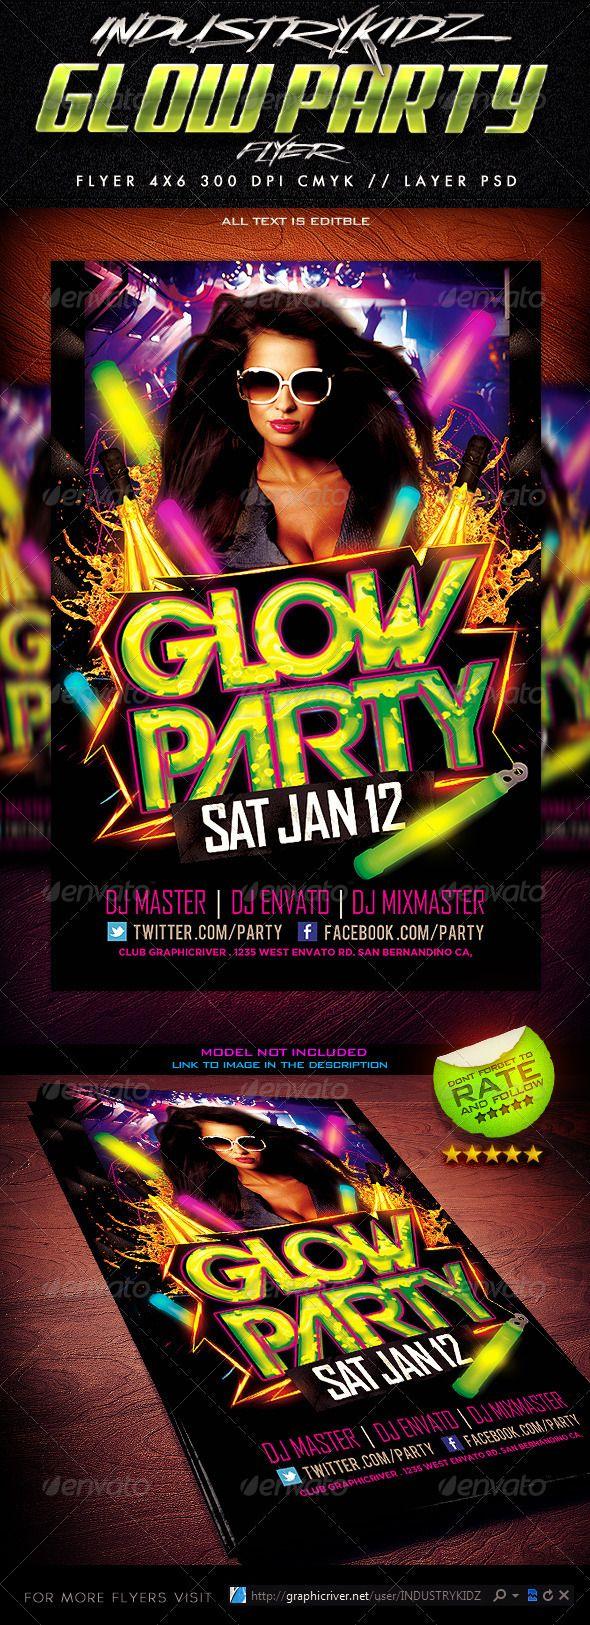 I'm am definitely having a glow PARTYY !